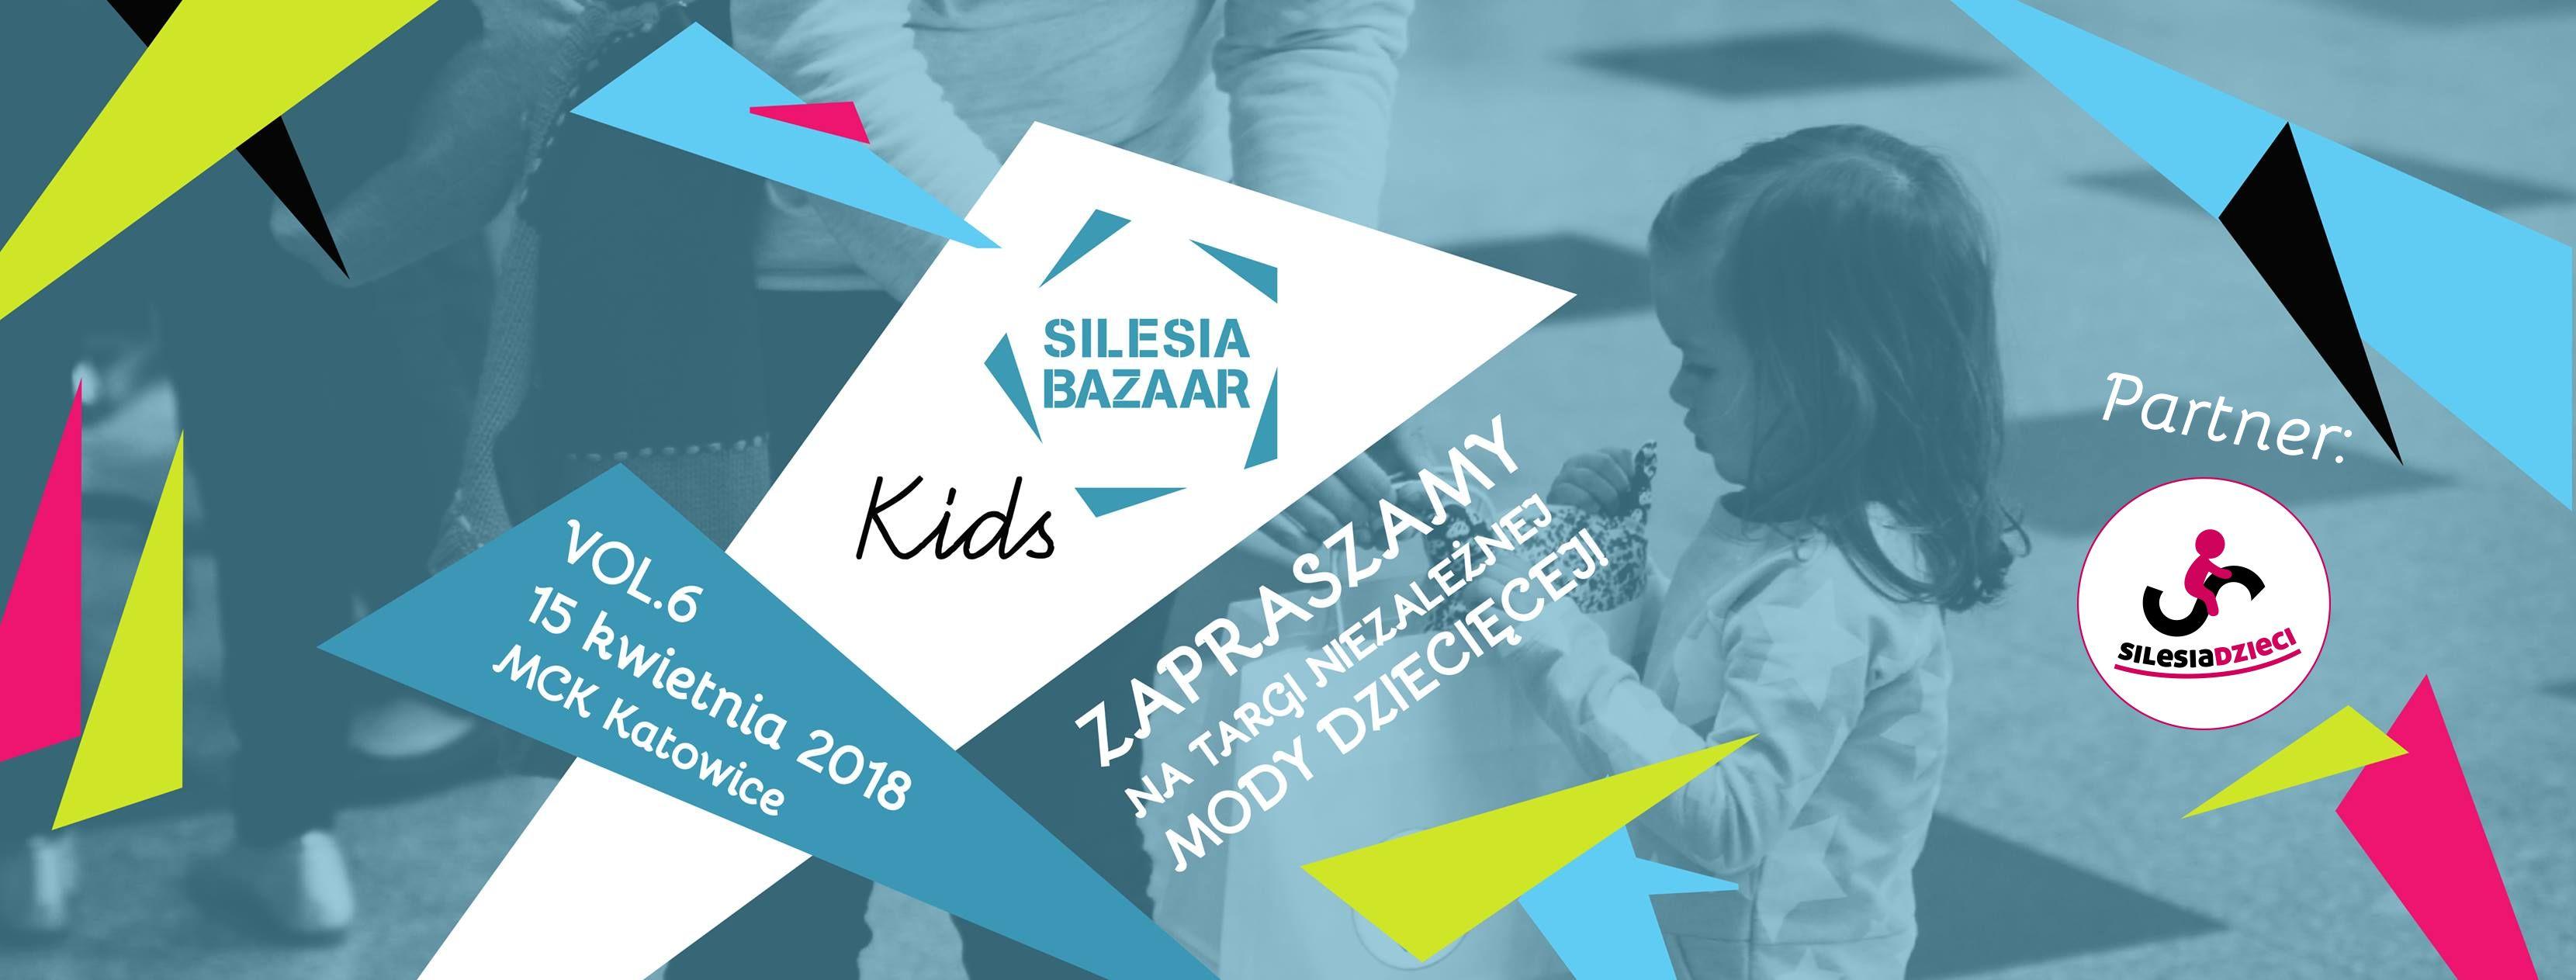 Silesia Bazaar Kids 6